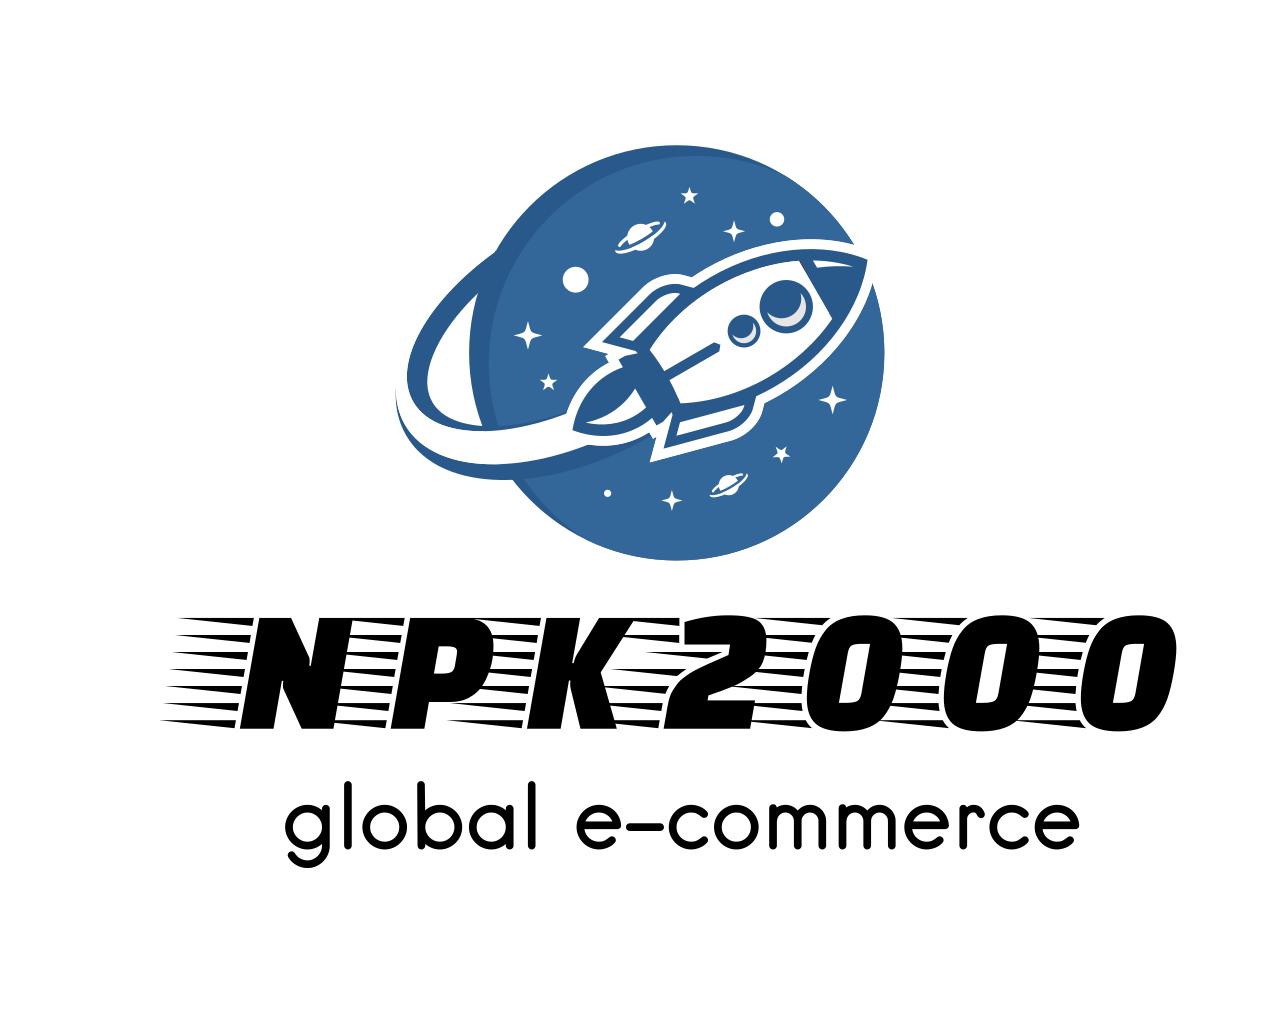 NPK2000